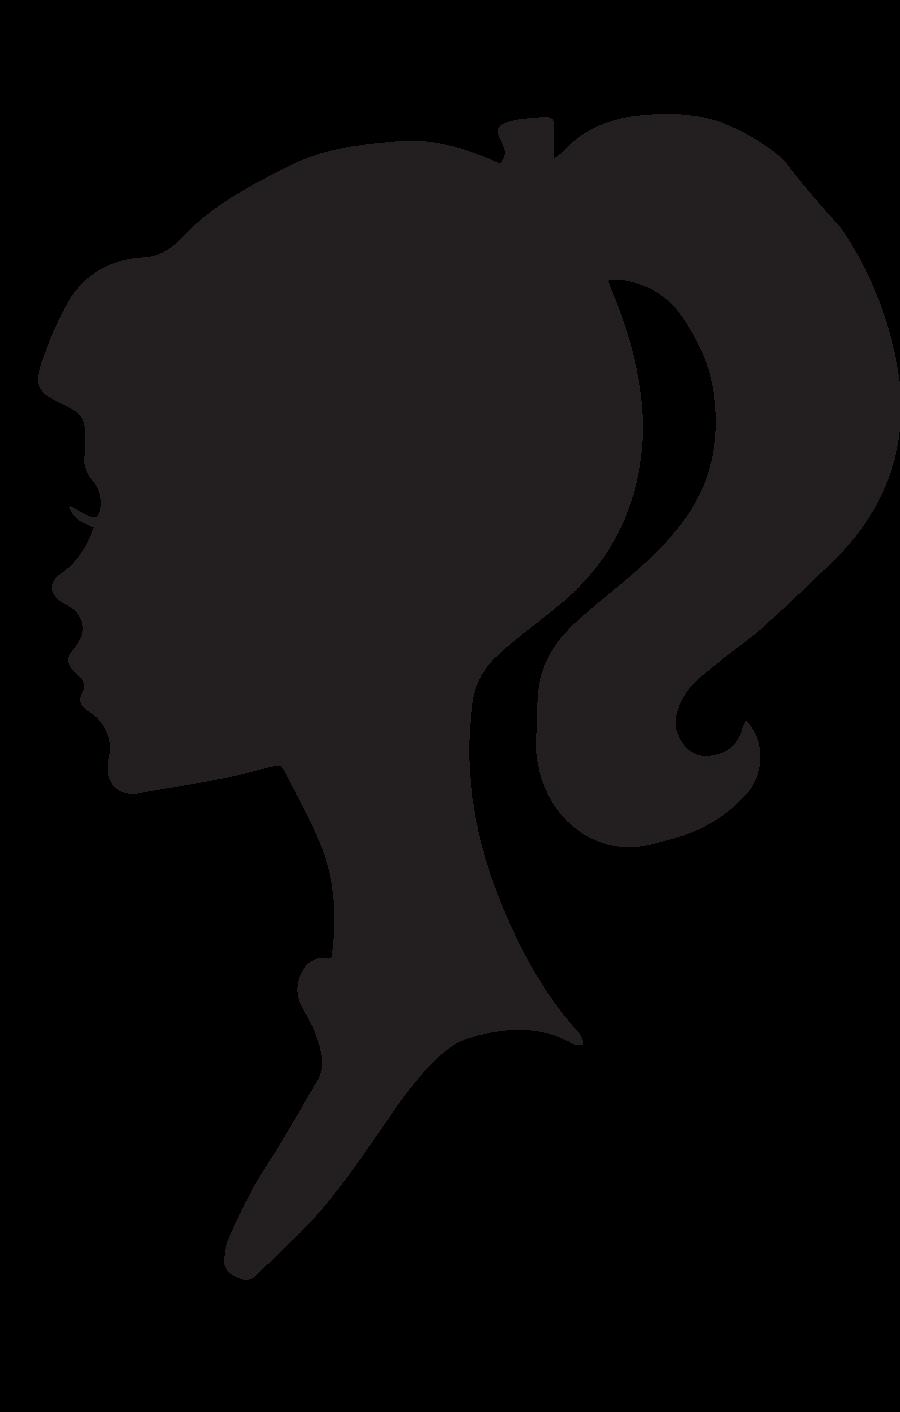 Free Women Profile Cliparts, Download Free Clip Art, Free.